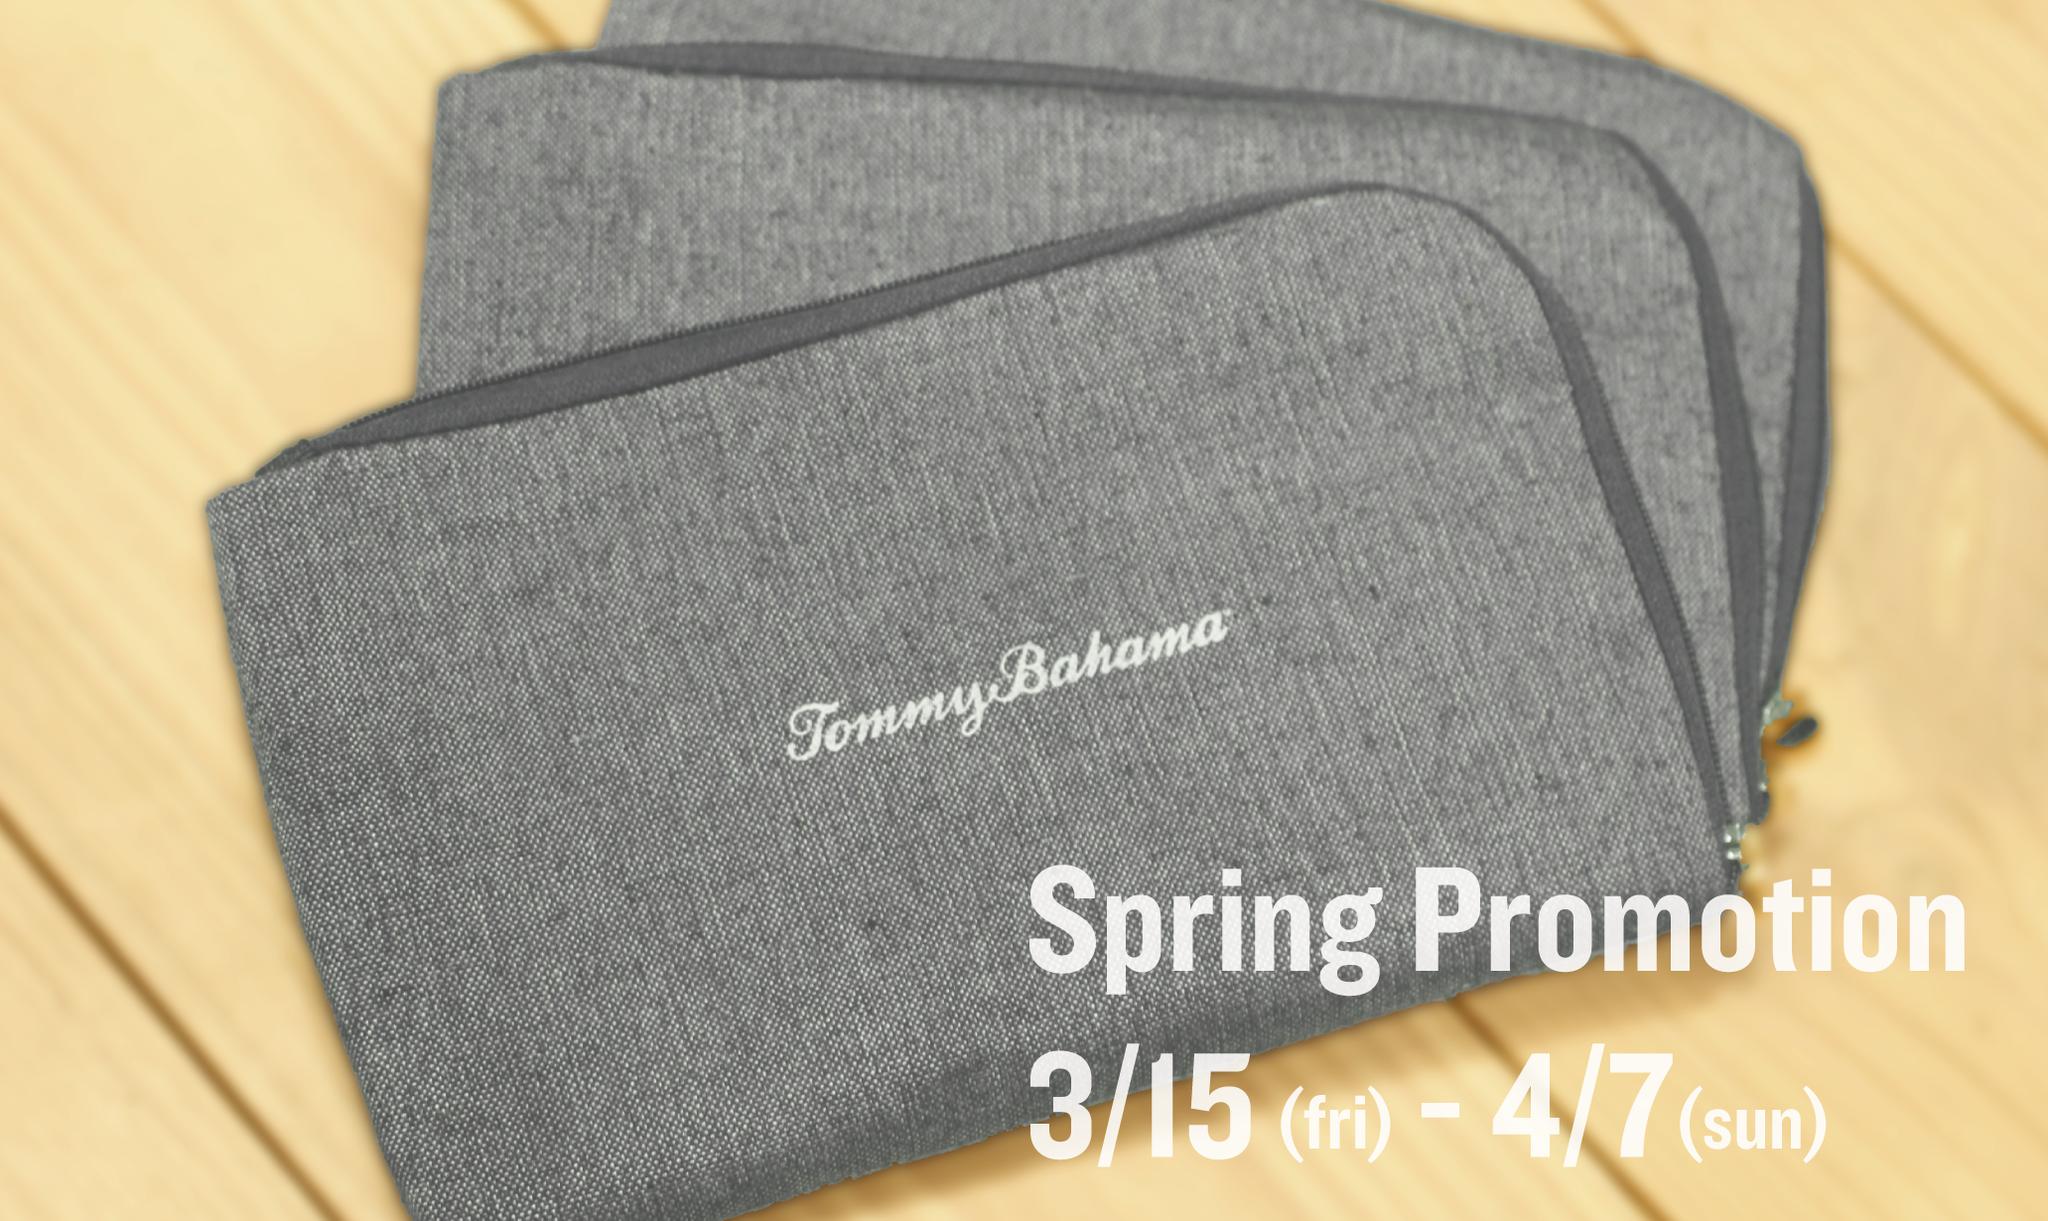 Spring Promotion 2019 期間中のご注文でスペシャルノベルティをプレゼント!